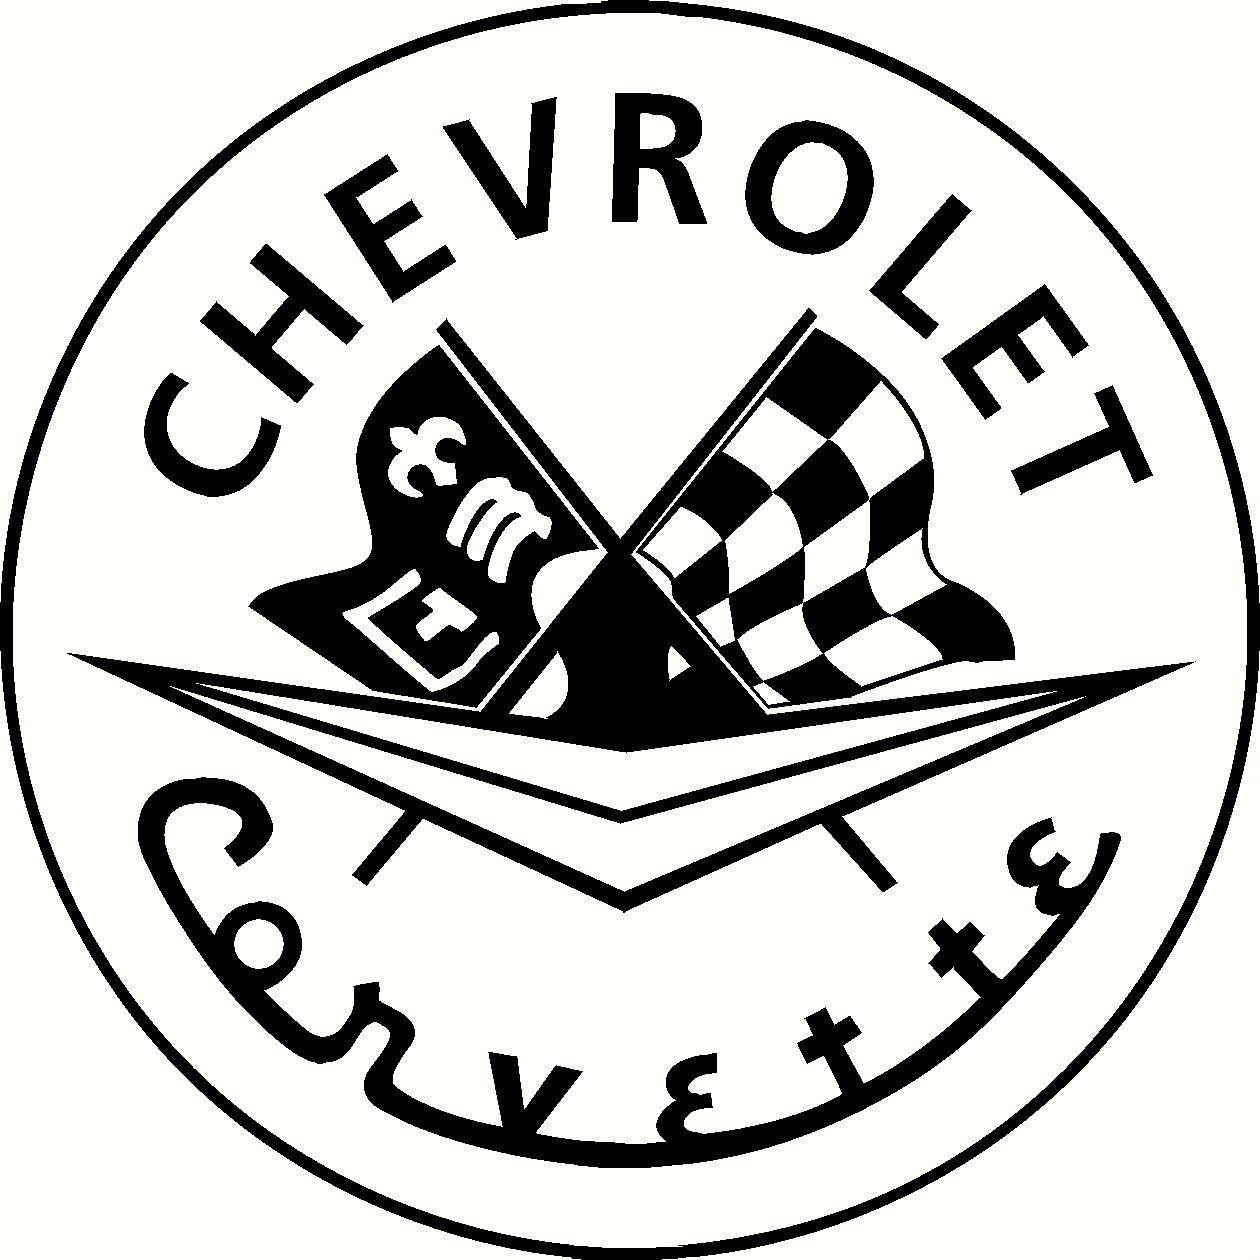 chevy emblem drawing at getdrawings com